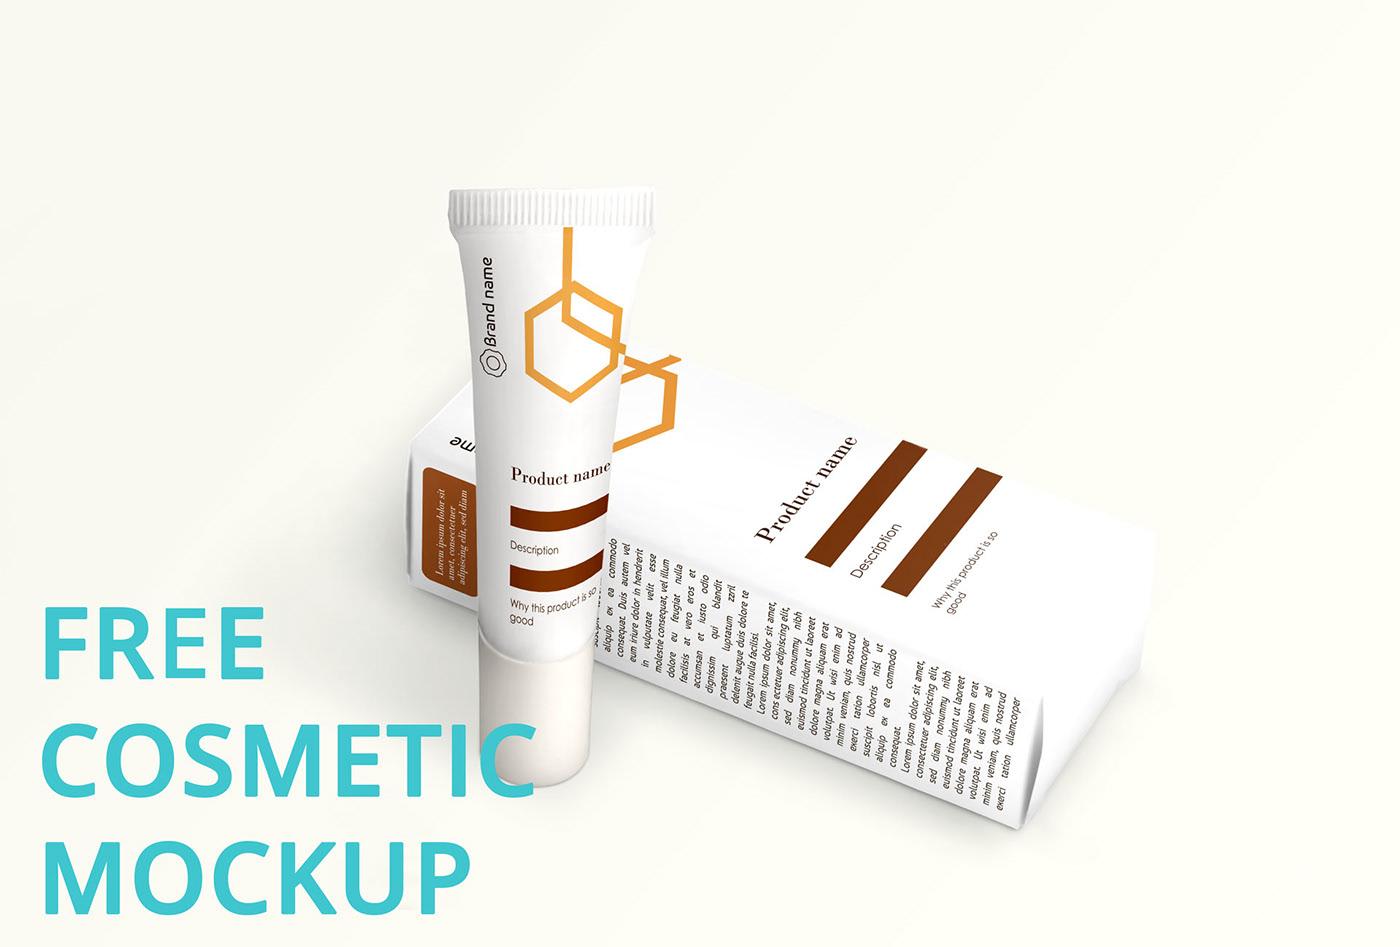 Free Cosmetic Mockup (v1) PSD